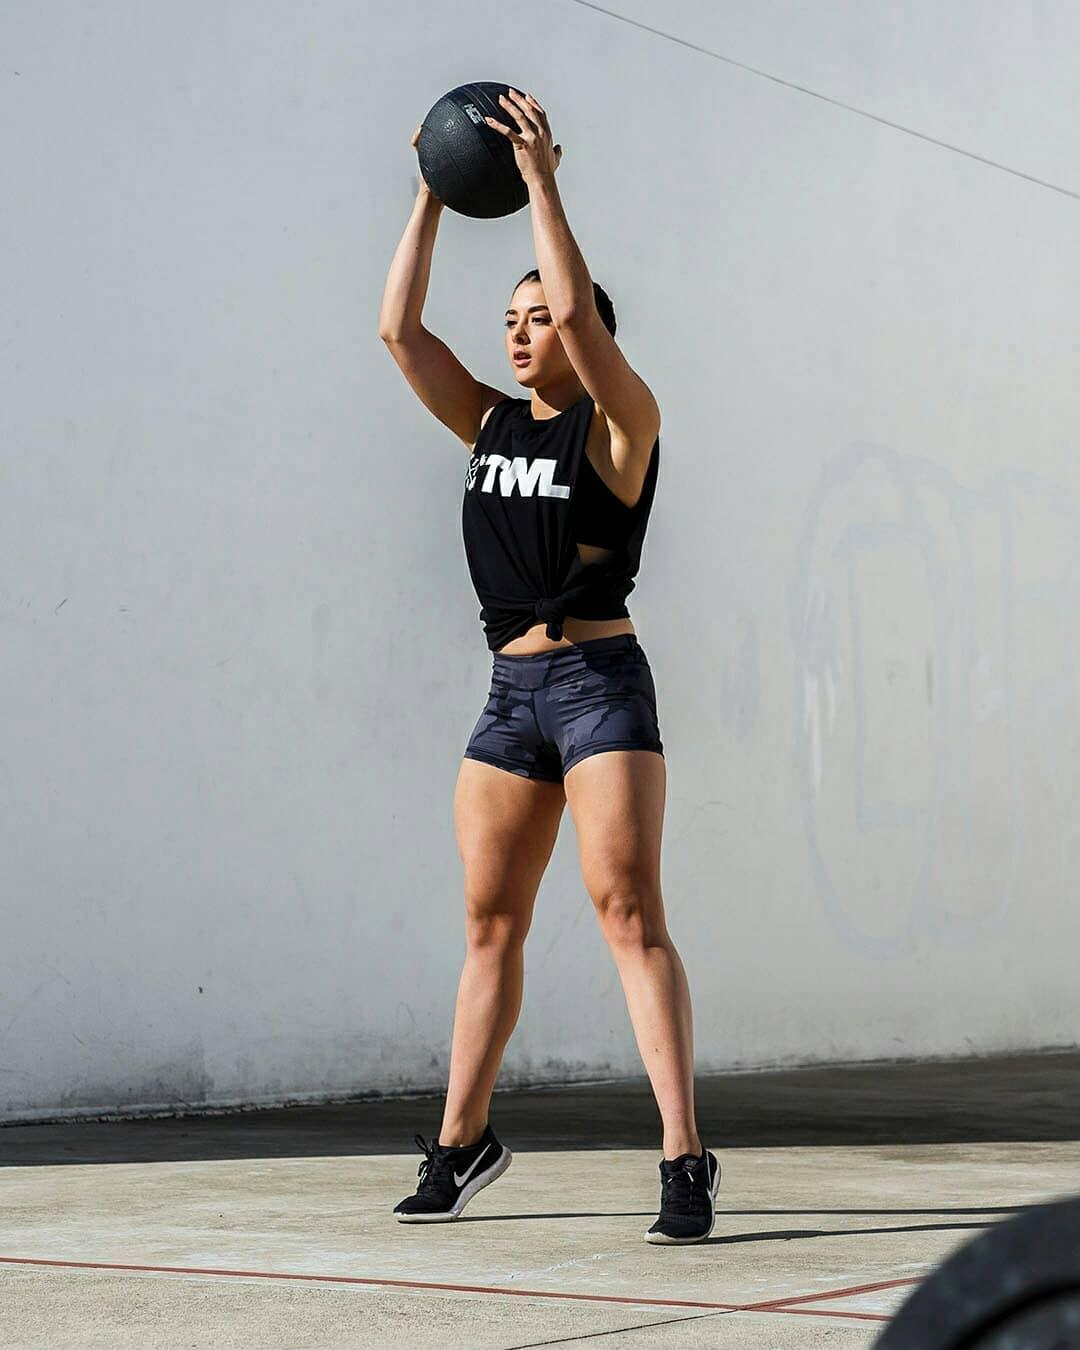 peoplemap-thewodlife-fitness-brands-on-instagram3.jpg